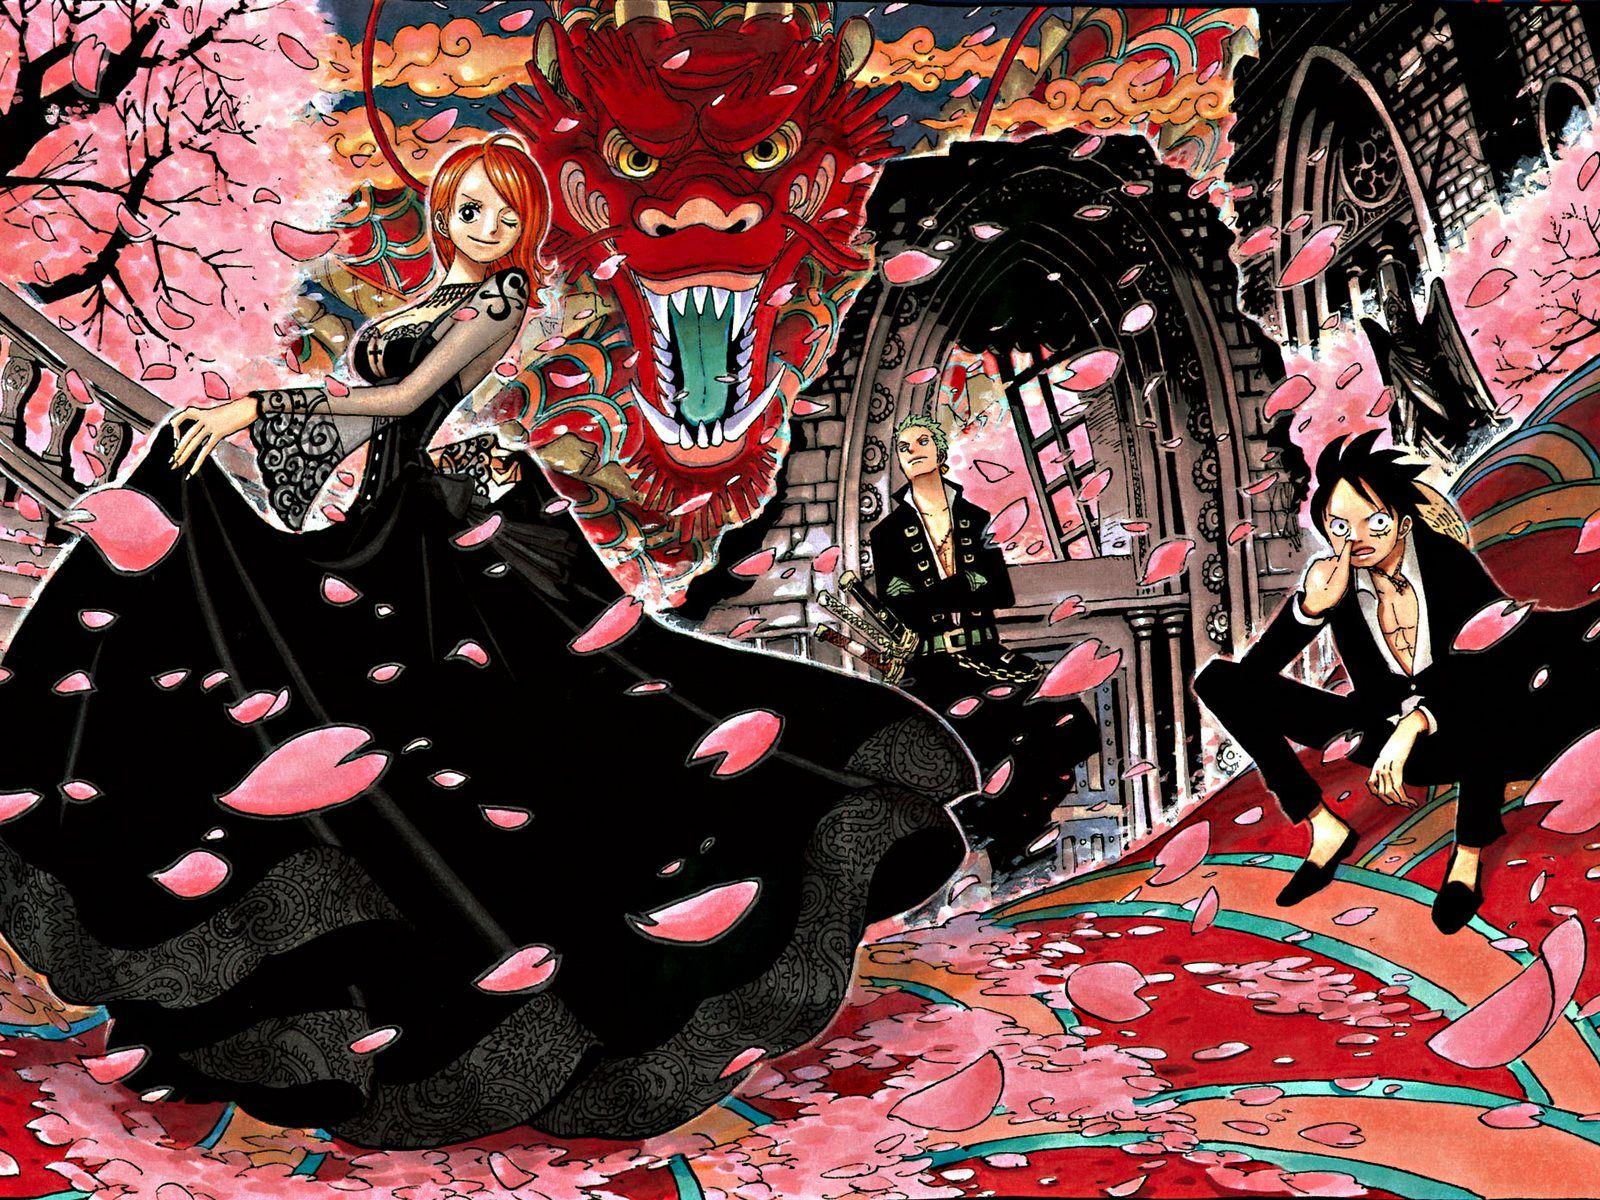 Hd wallpaper one piece zoro - One Piece Nami Zoro Luffy Straw Hat Pirate Cherry Blossom Dragon Anime